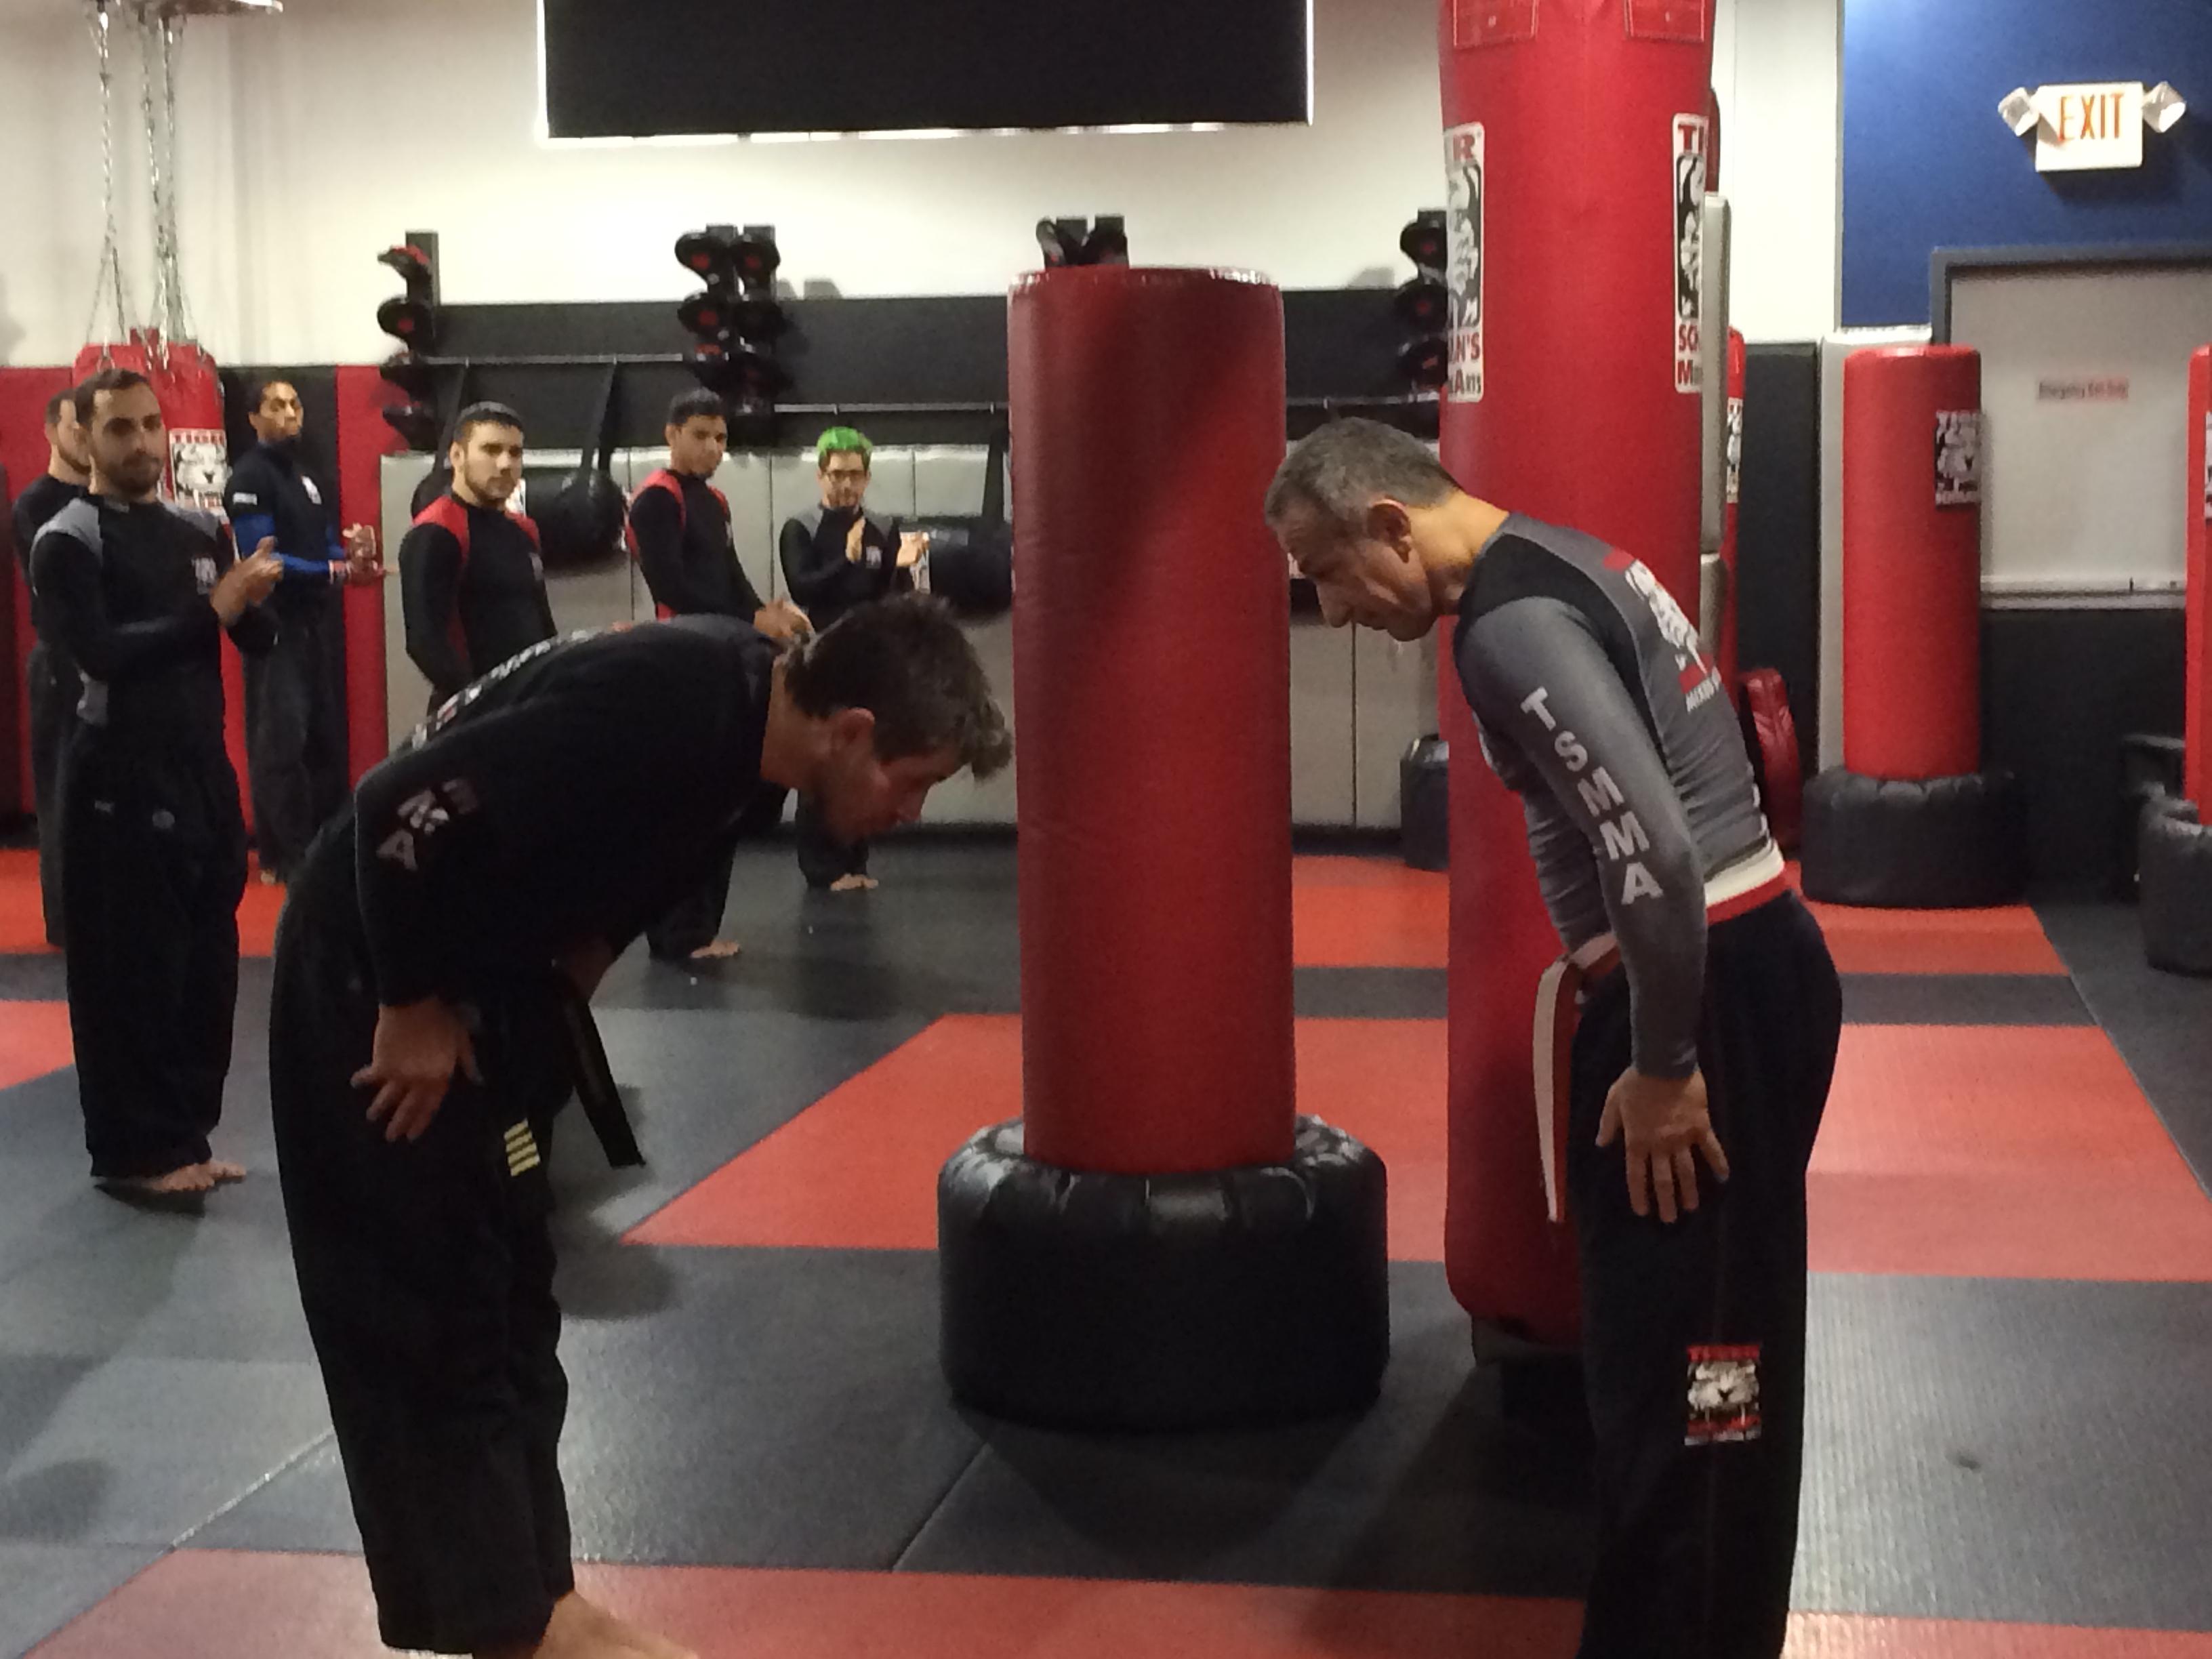 Tiger Schulmann's Martial Arts | Men Bowing